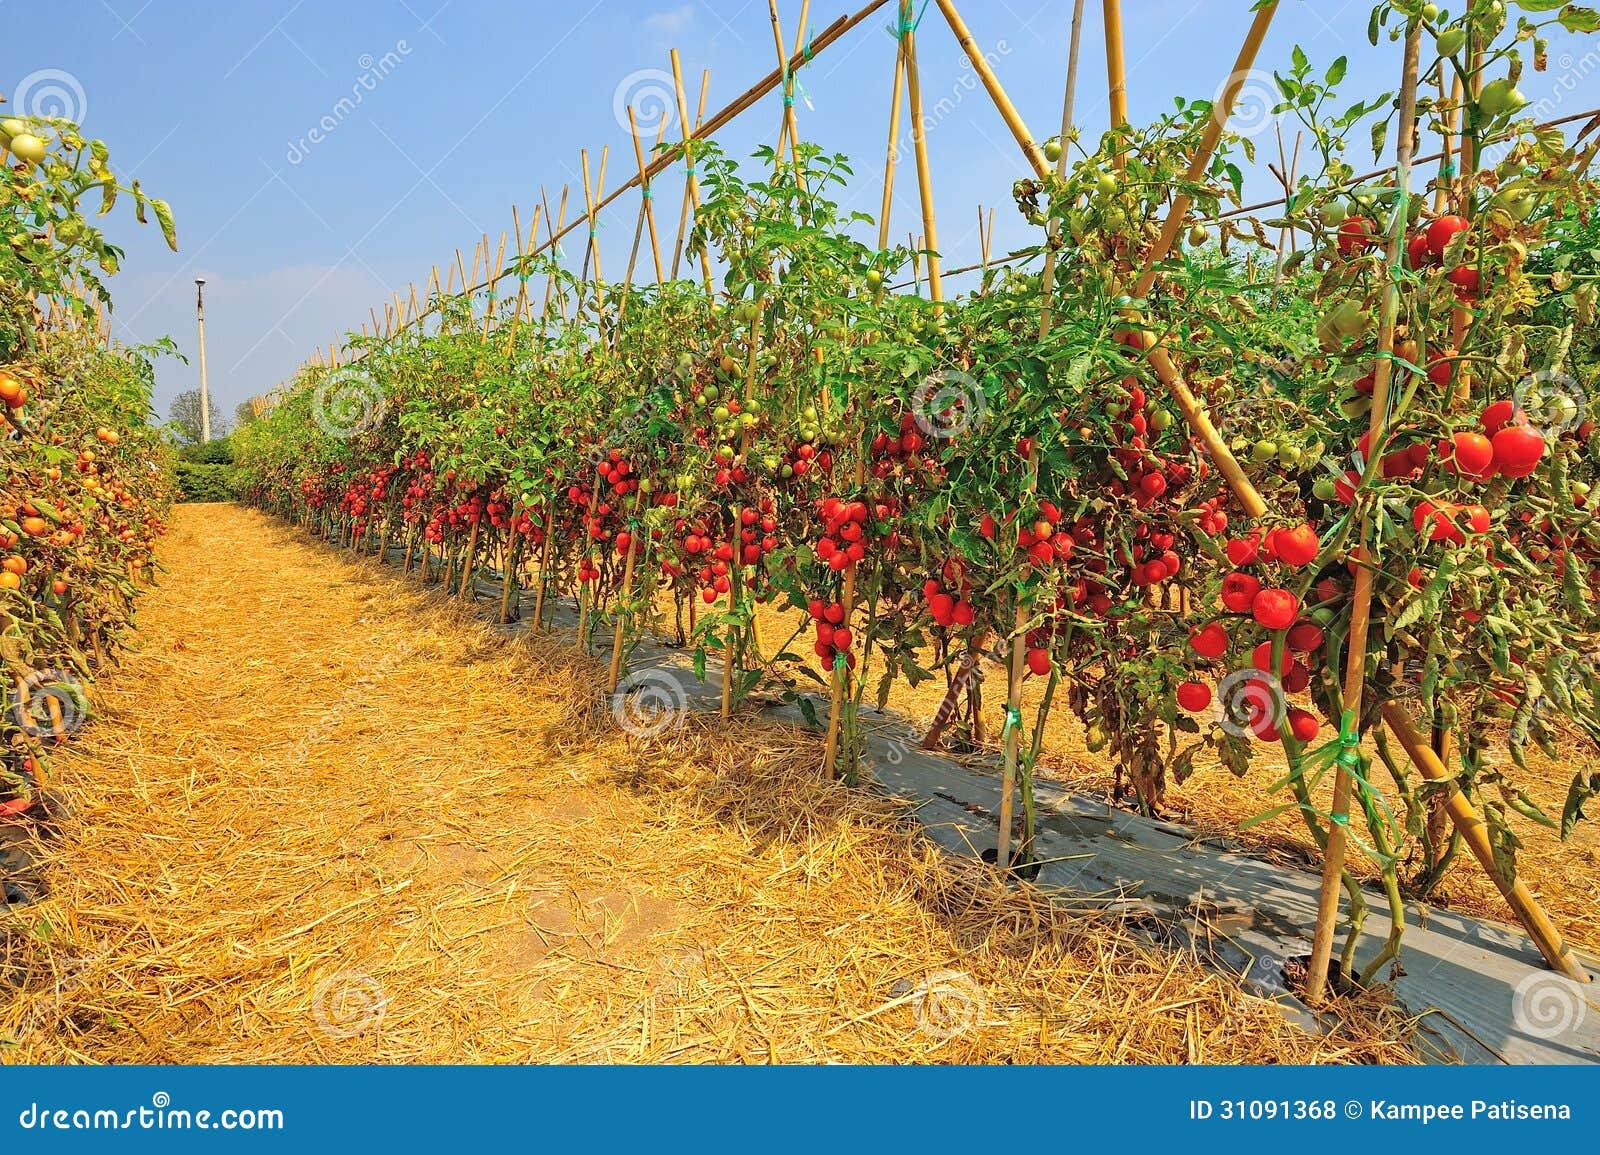 Plantation With Fresh Tomato Royalty Free Stock Photos - Image ...